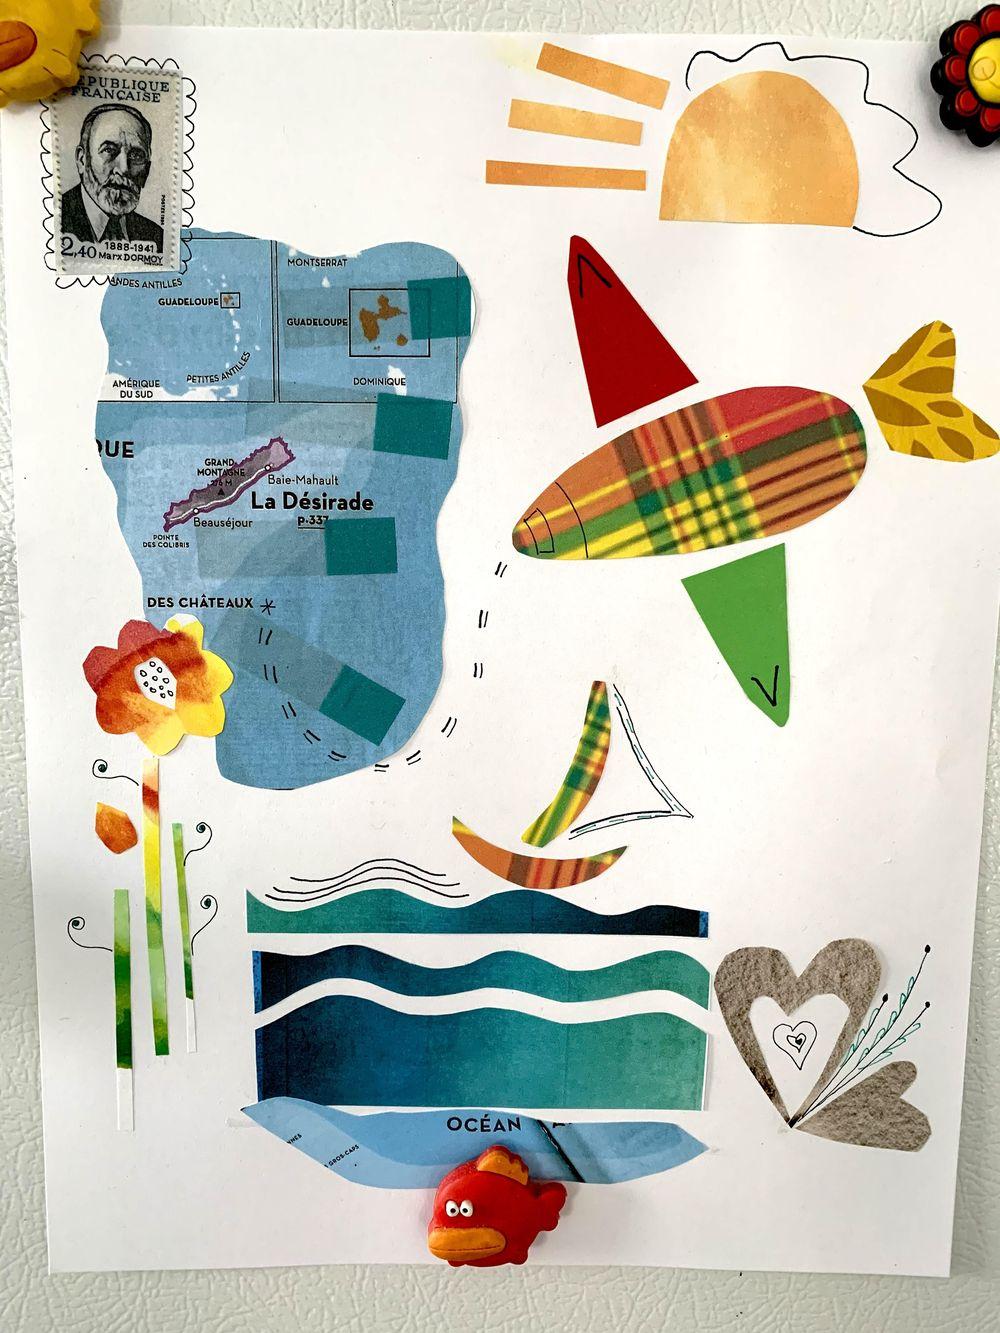 Histoires de collage ;-) - image 2 - student project